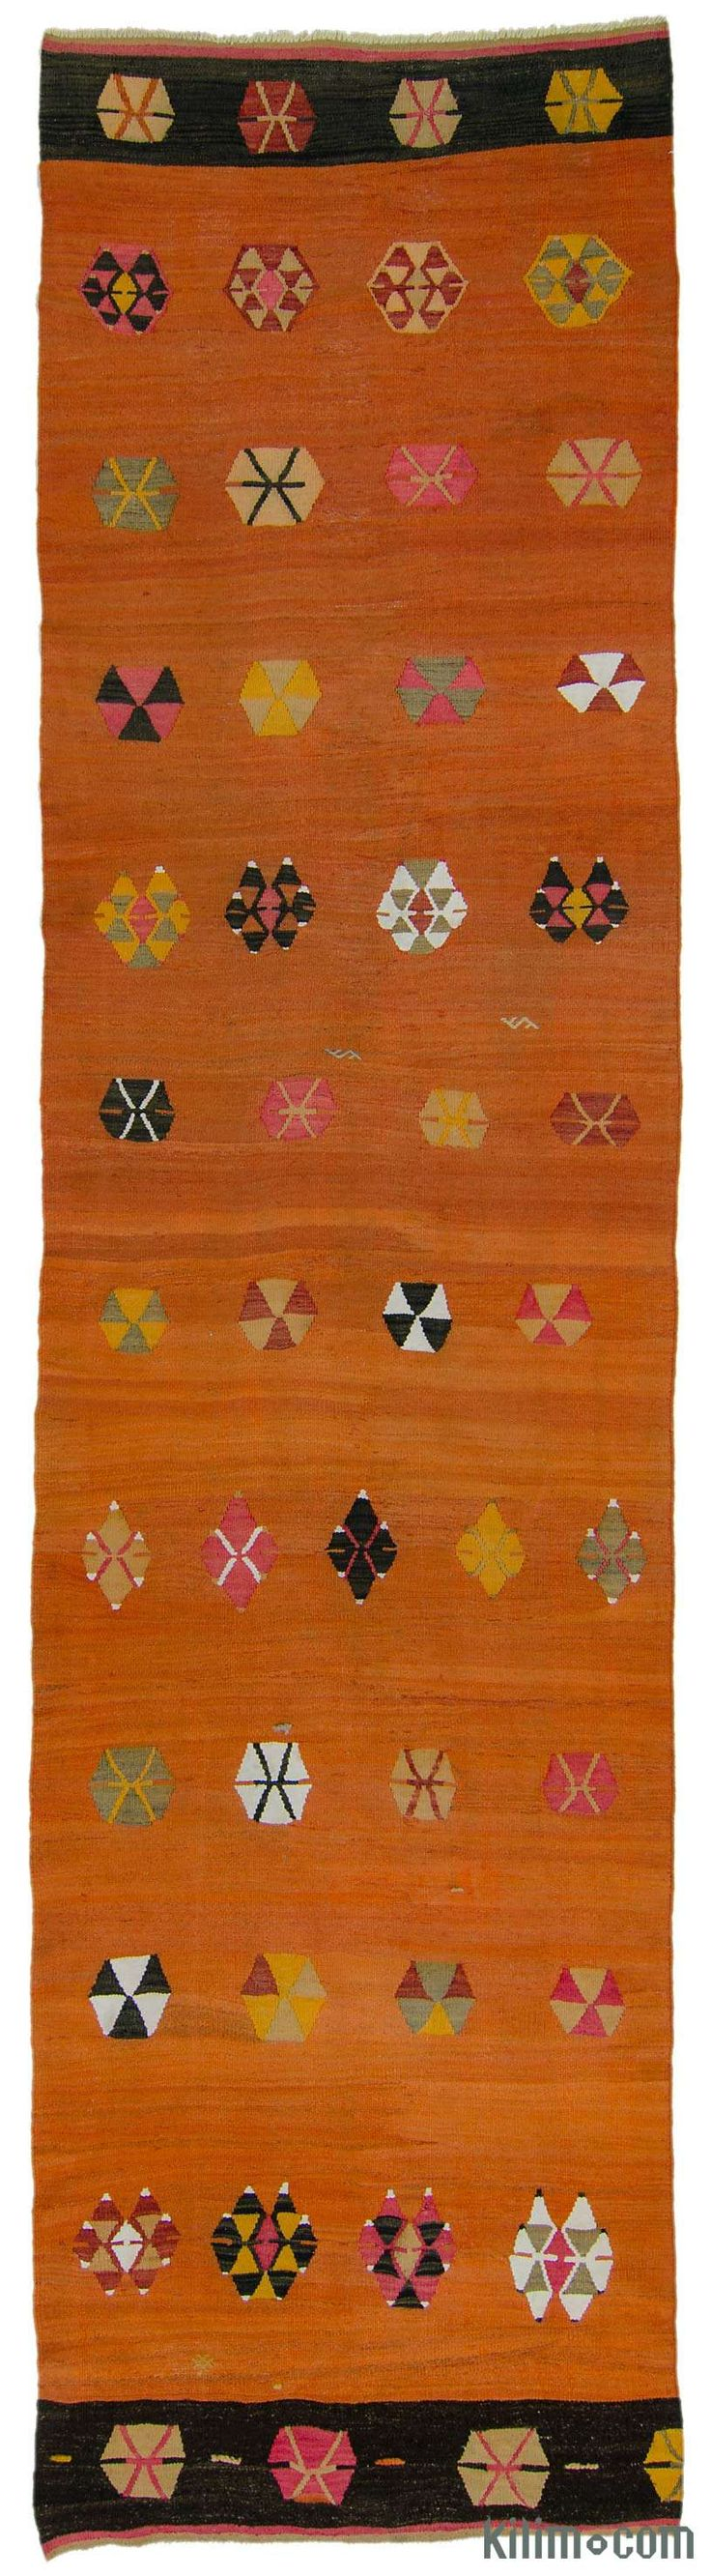 Vintage tribal Turkish kilim runner rug around 70 years old. This kilim runner was hand-woven in the Sivas region of Central Anatolia, Turkey.